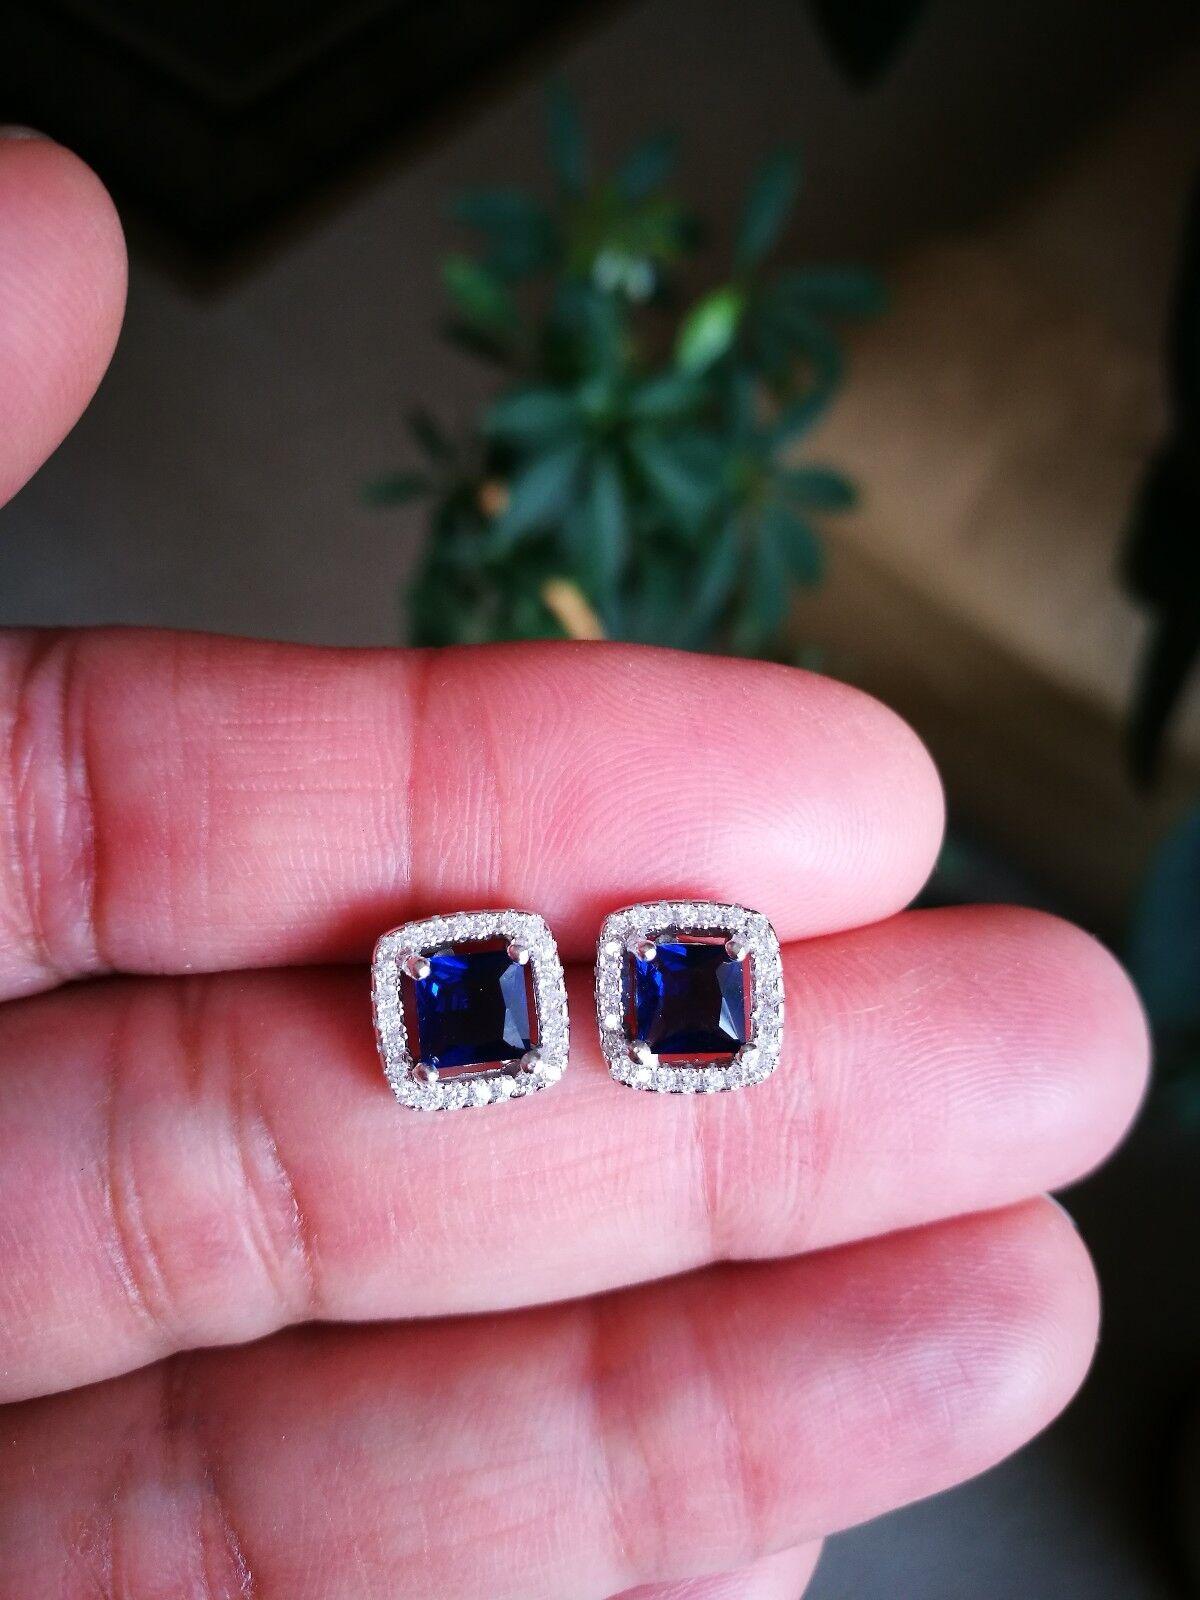 2 Ct Diamond Halo Stud Earrings with Blue Sapphire Women's Studs 14K White Gold 1